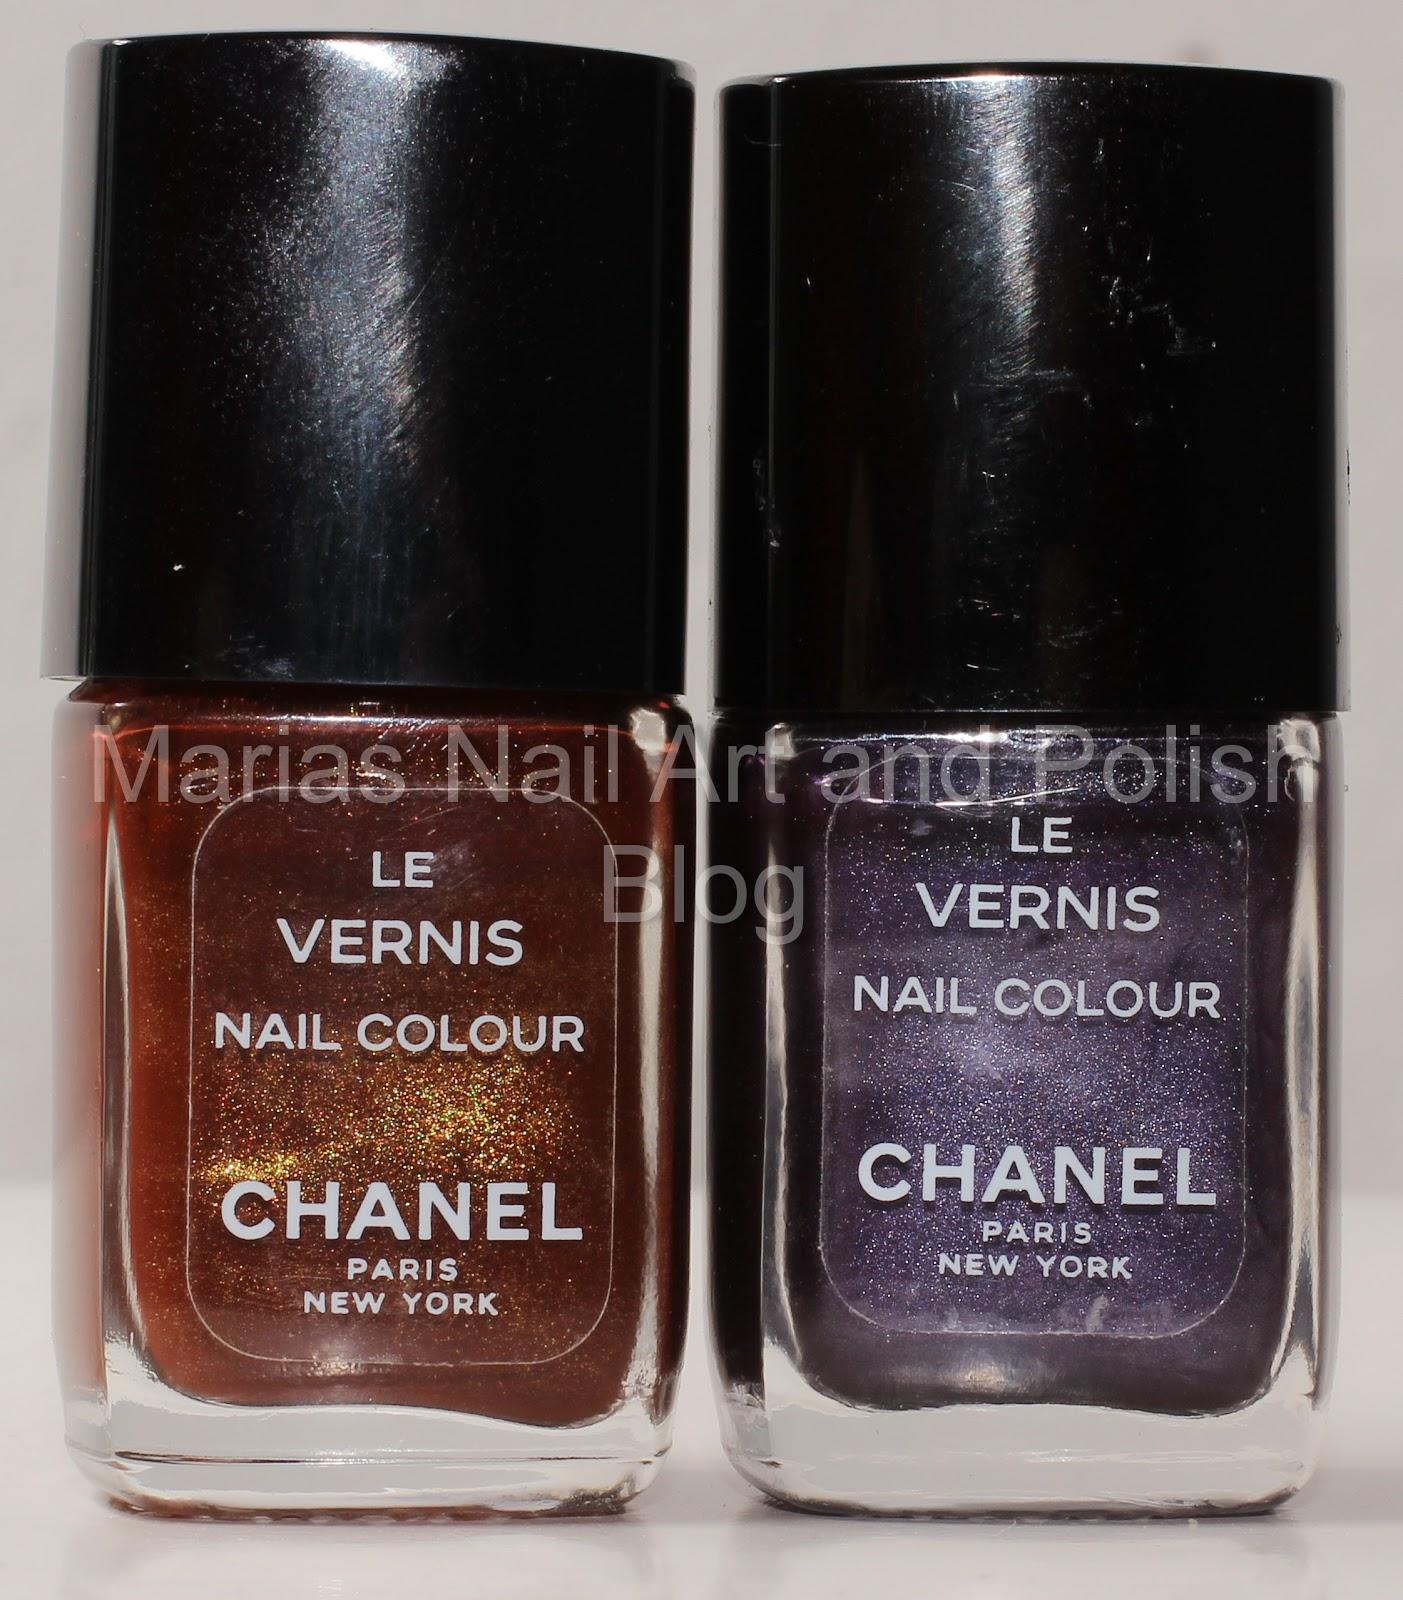 Marias Nail Art And Polish Blog: Chanel Rouge Noir 18